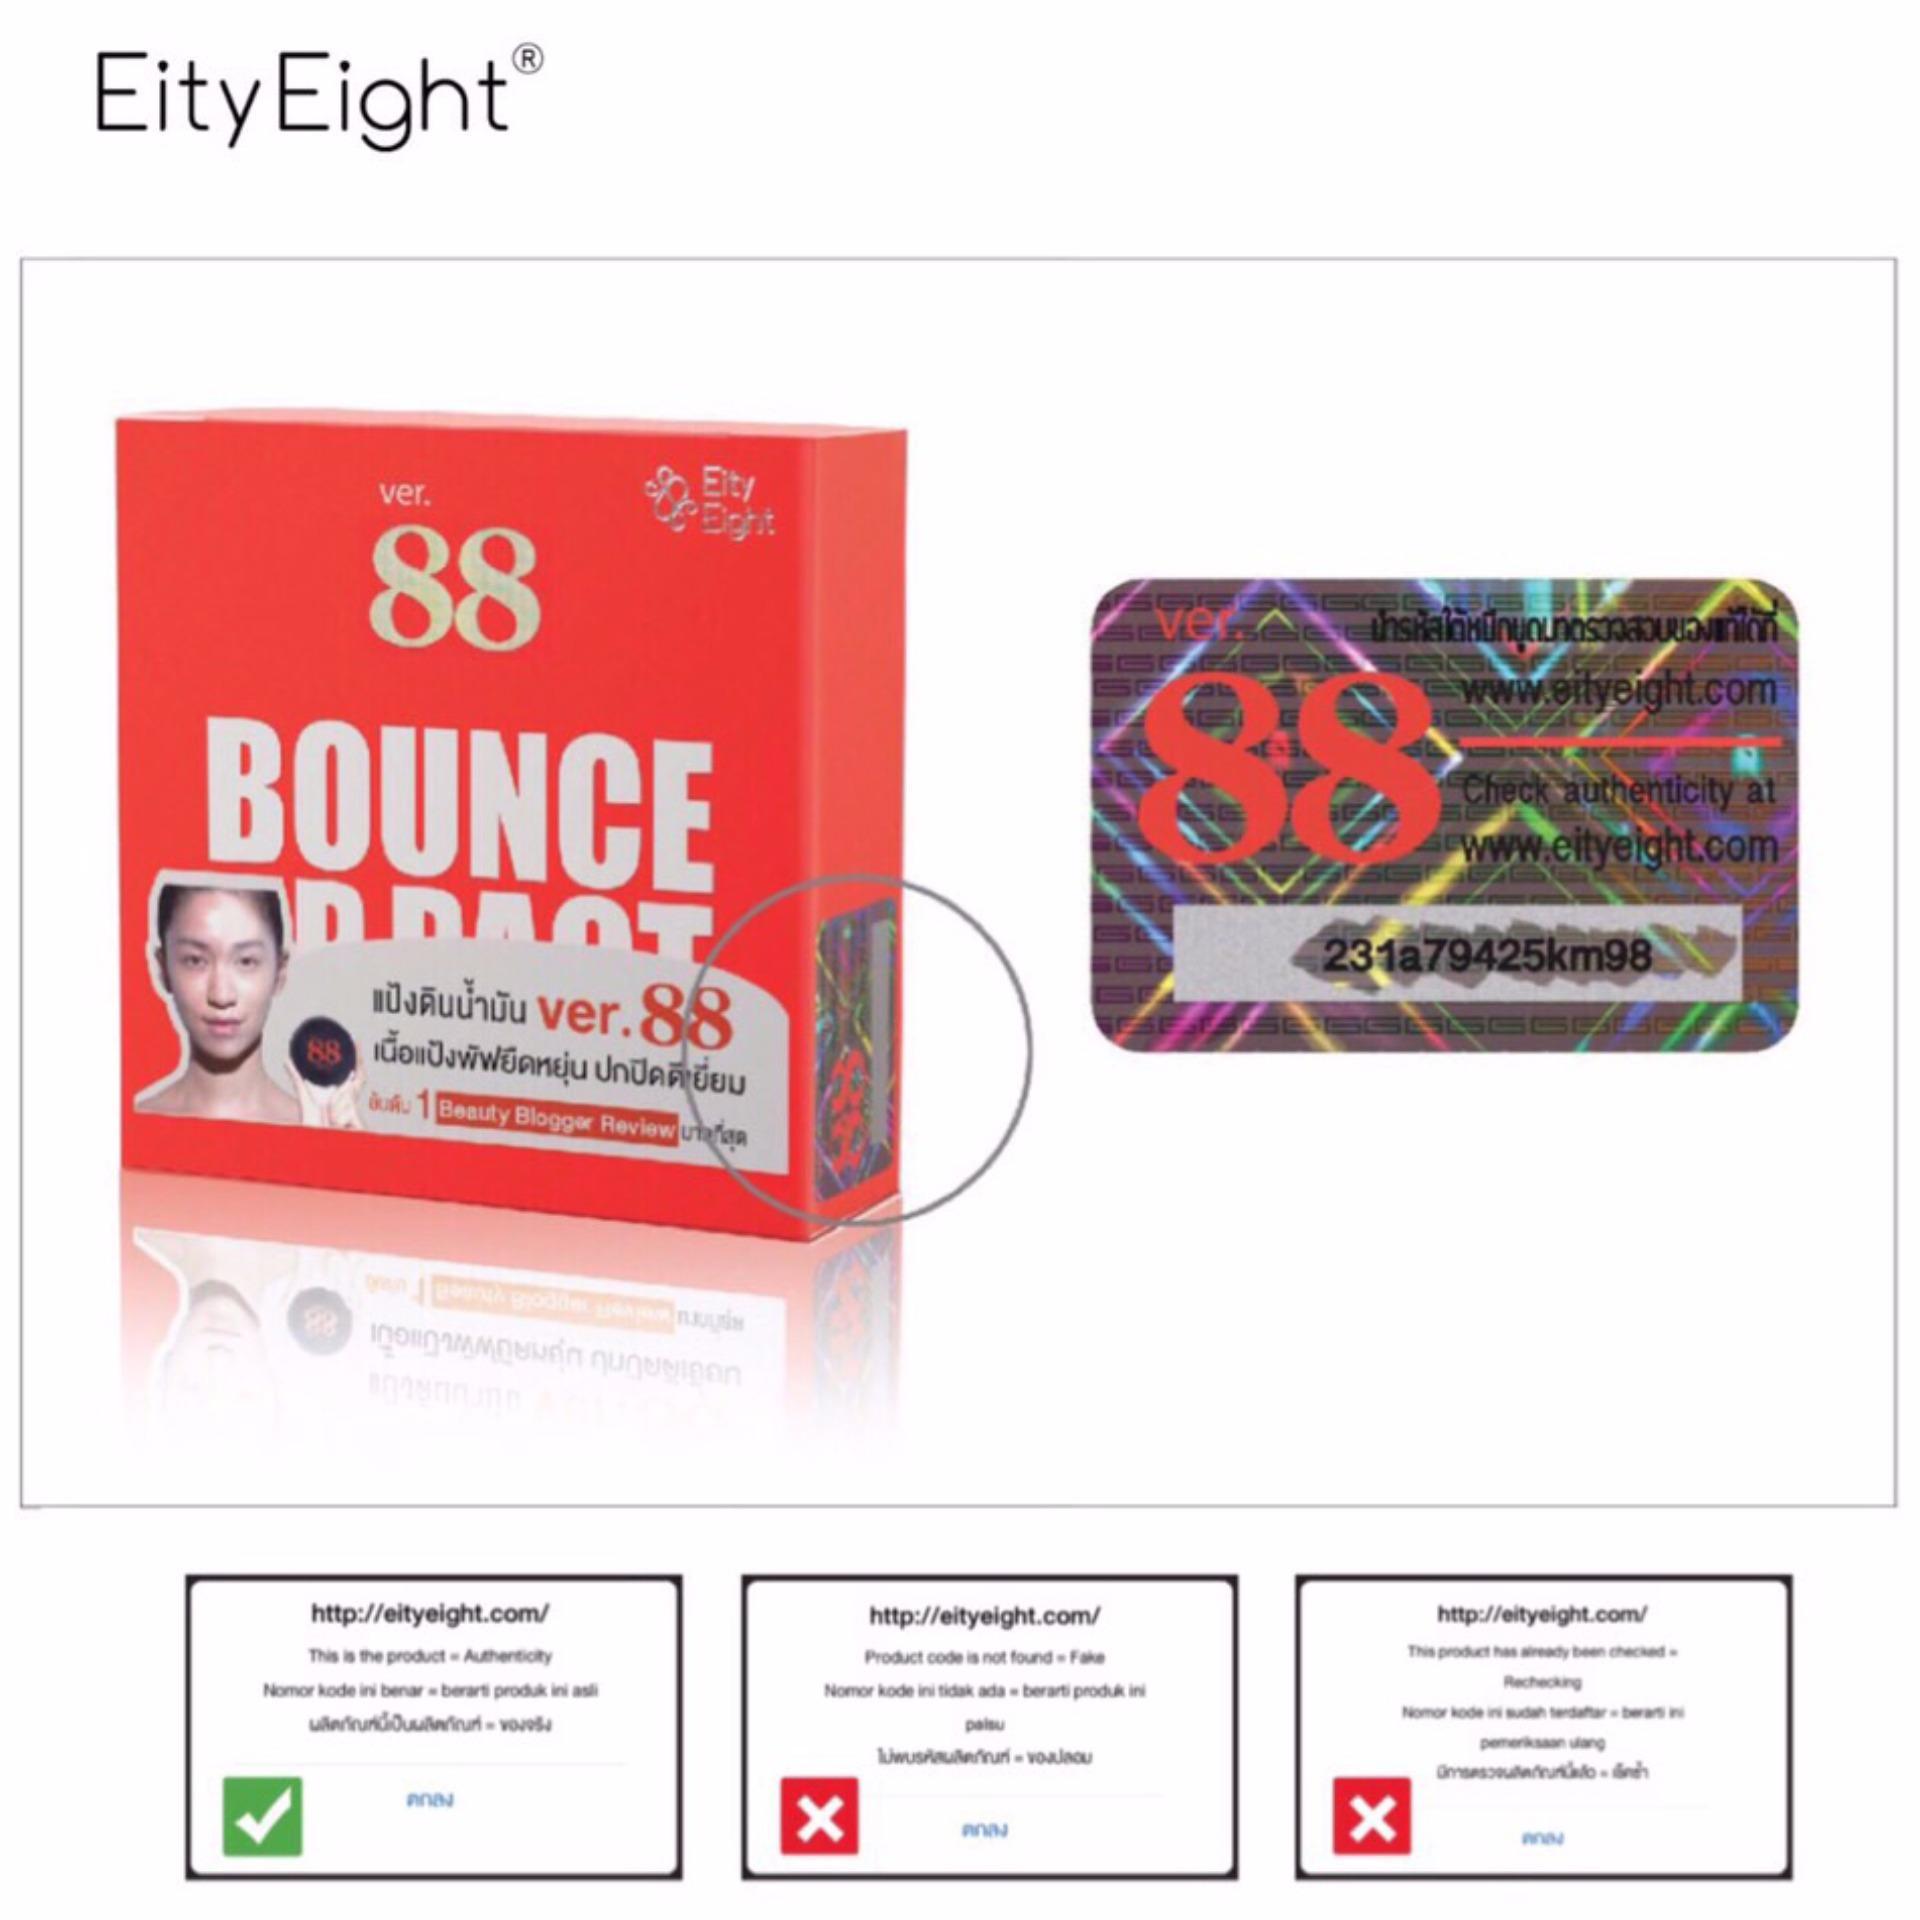 Eityeight Bounce Up Pack Ver88 Original Thailand Ada Tracking Code Sudah BPOM .